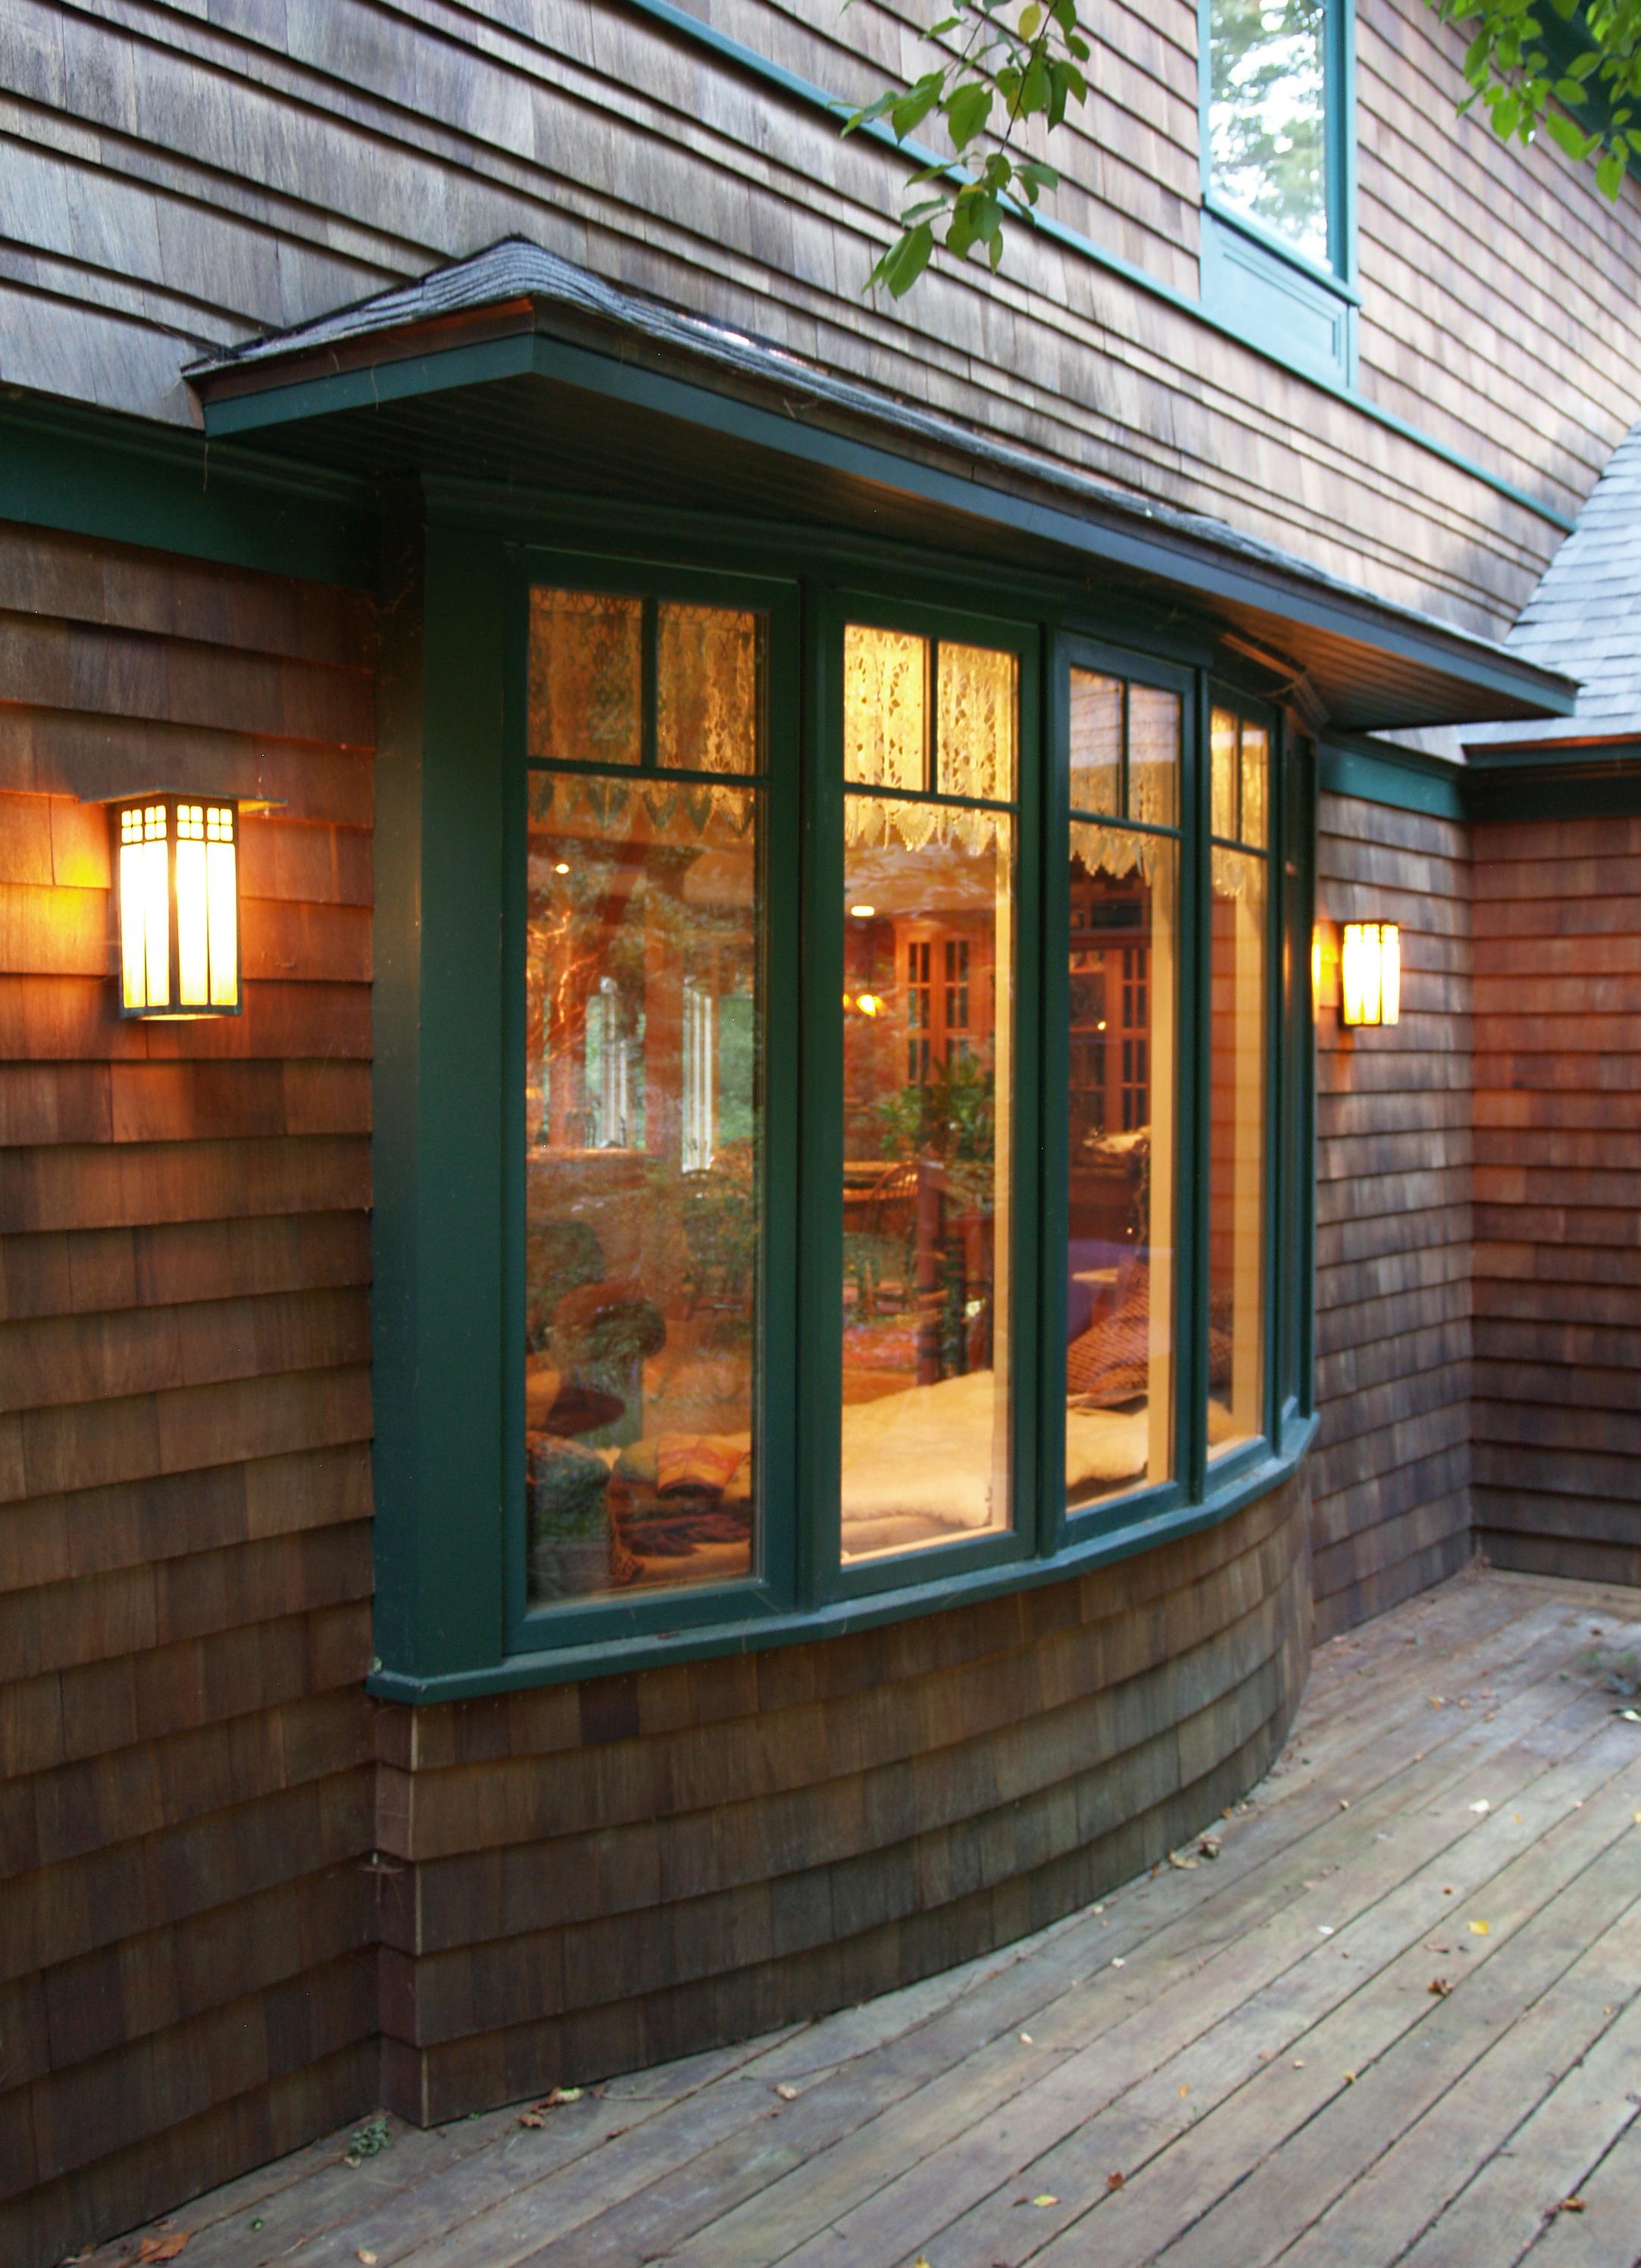 Warm light at bay window